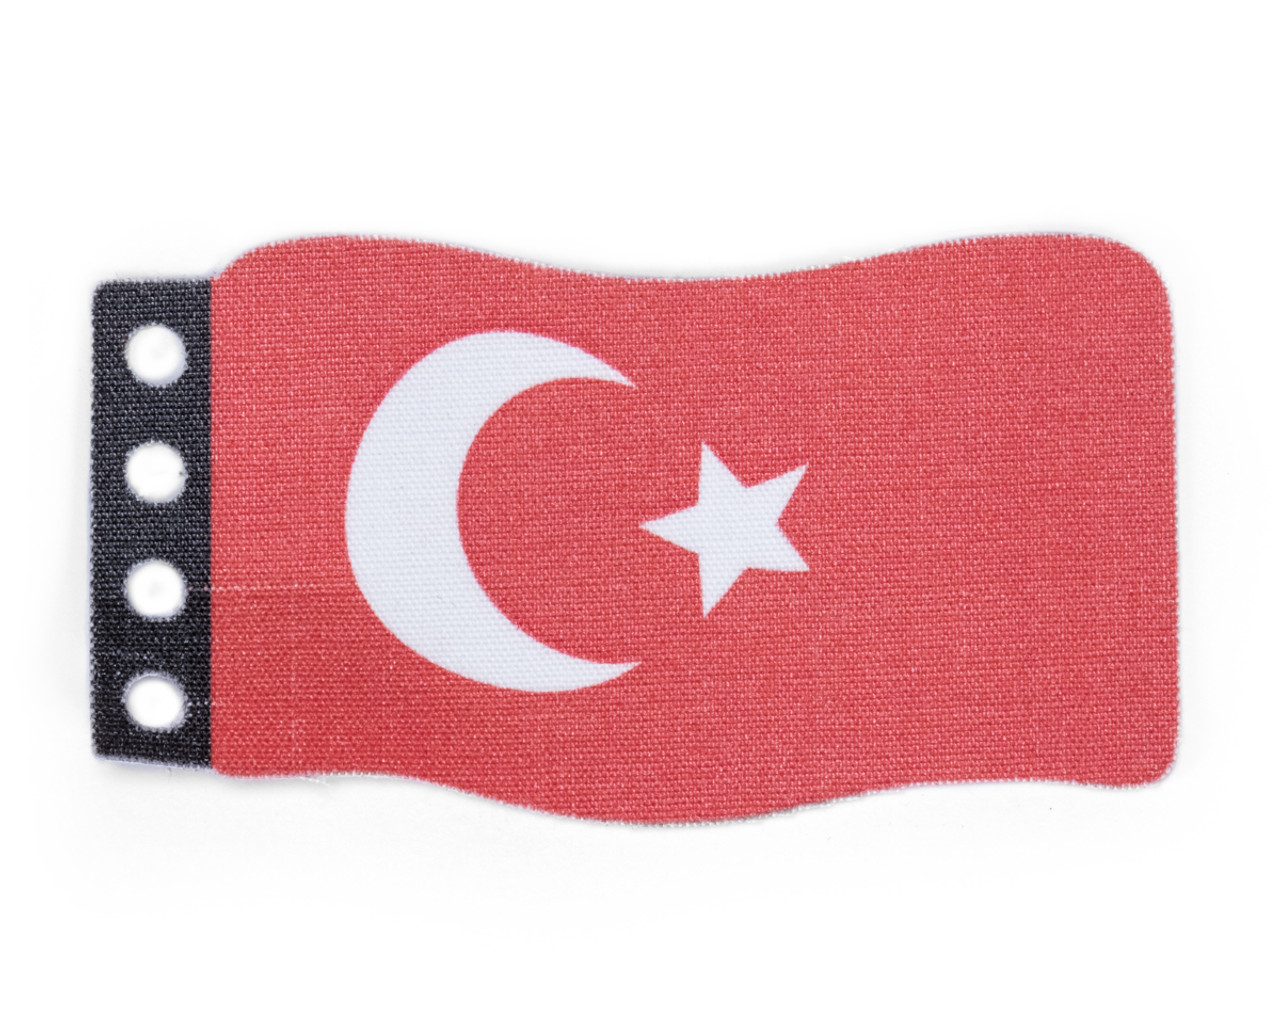 63ce5d36846 Shop by Brand. Brickmania · BrickArms · Minifig.Cat · View all Brands.  Previous. Flag - Ottoman Empire